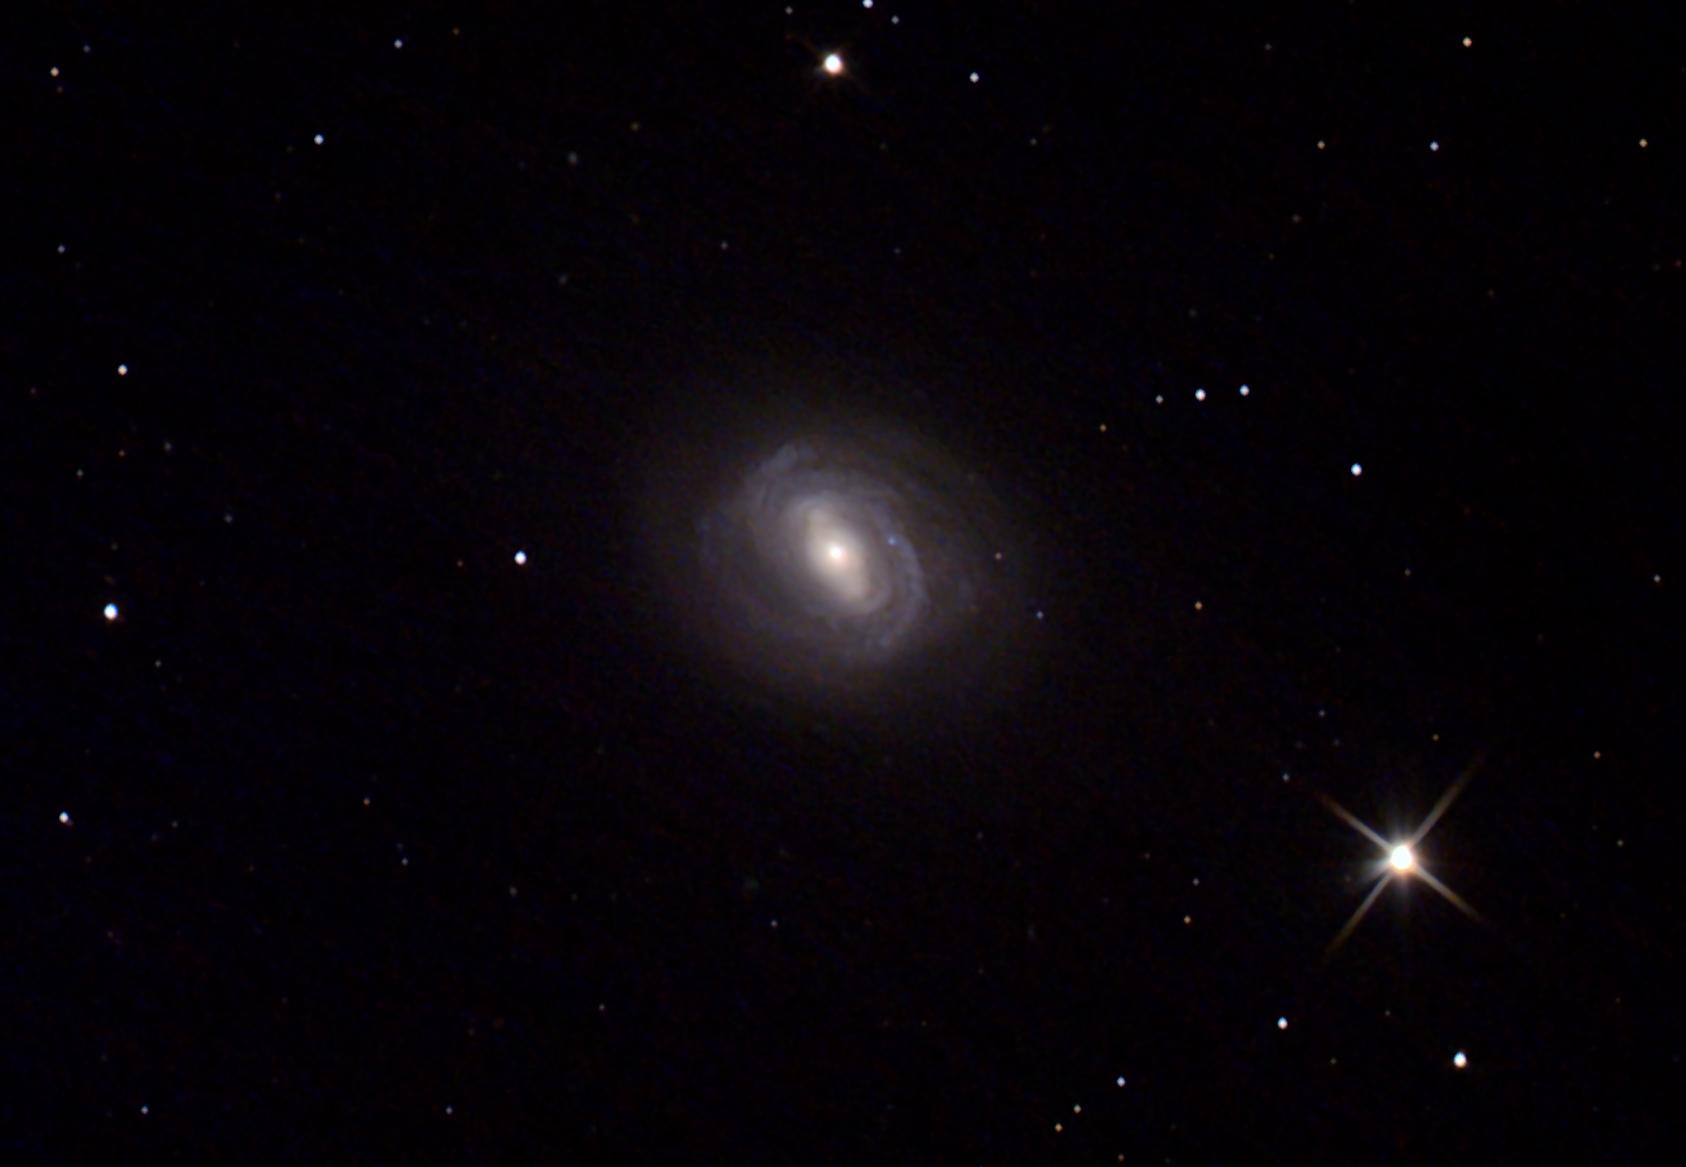 Pcropastrosurfacer2_NGC4394_NGC4394_24052020-21h50TU.jpg.8e6628c11b3d71e74257f6e3f19e7af1.jpg